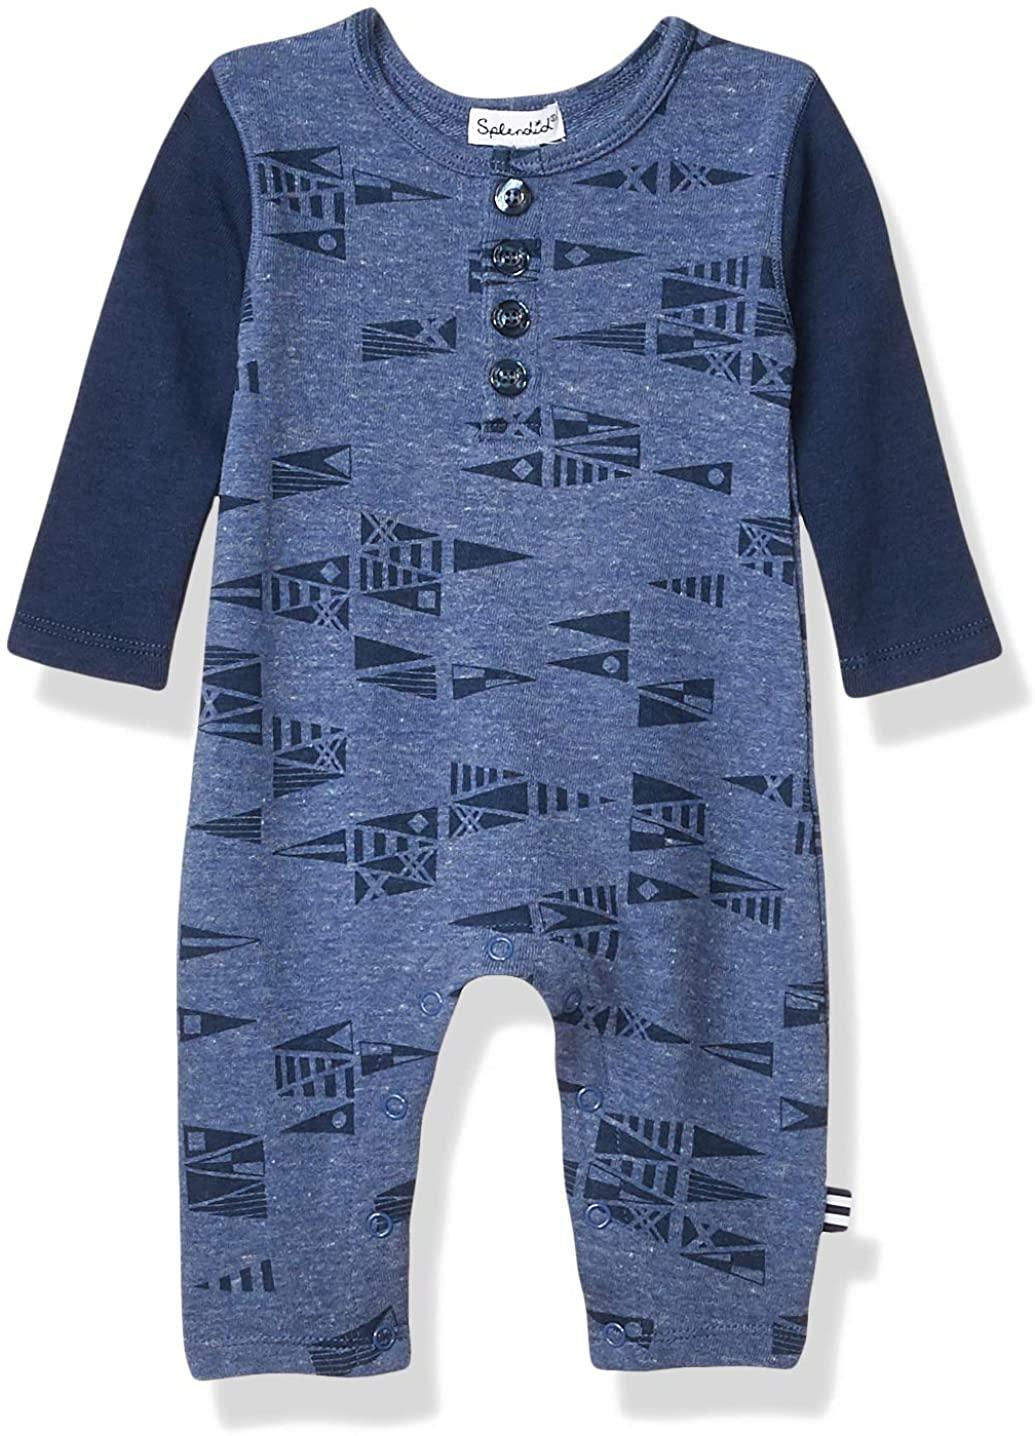 Splendid Baby Boys' Kids' Long Sleeve Coverall, Dark Blue Heather, 0/3 Mo